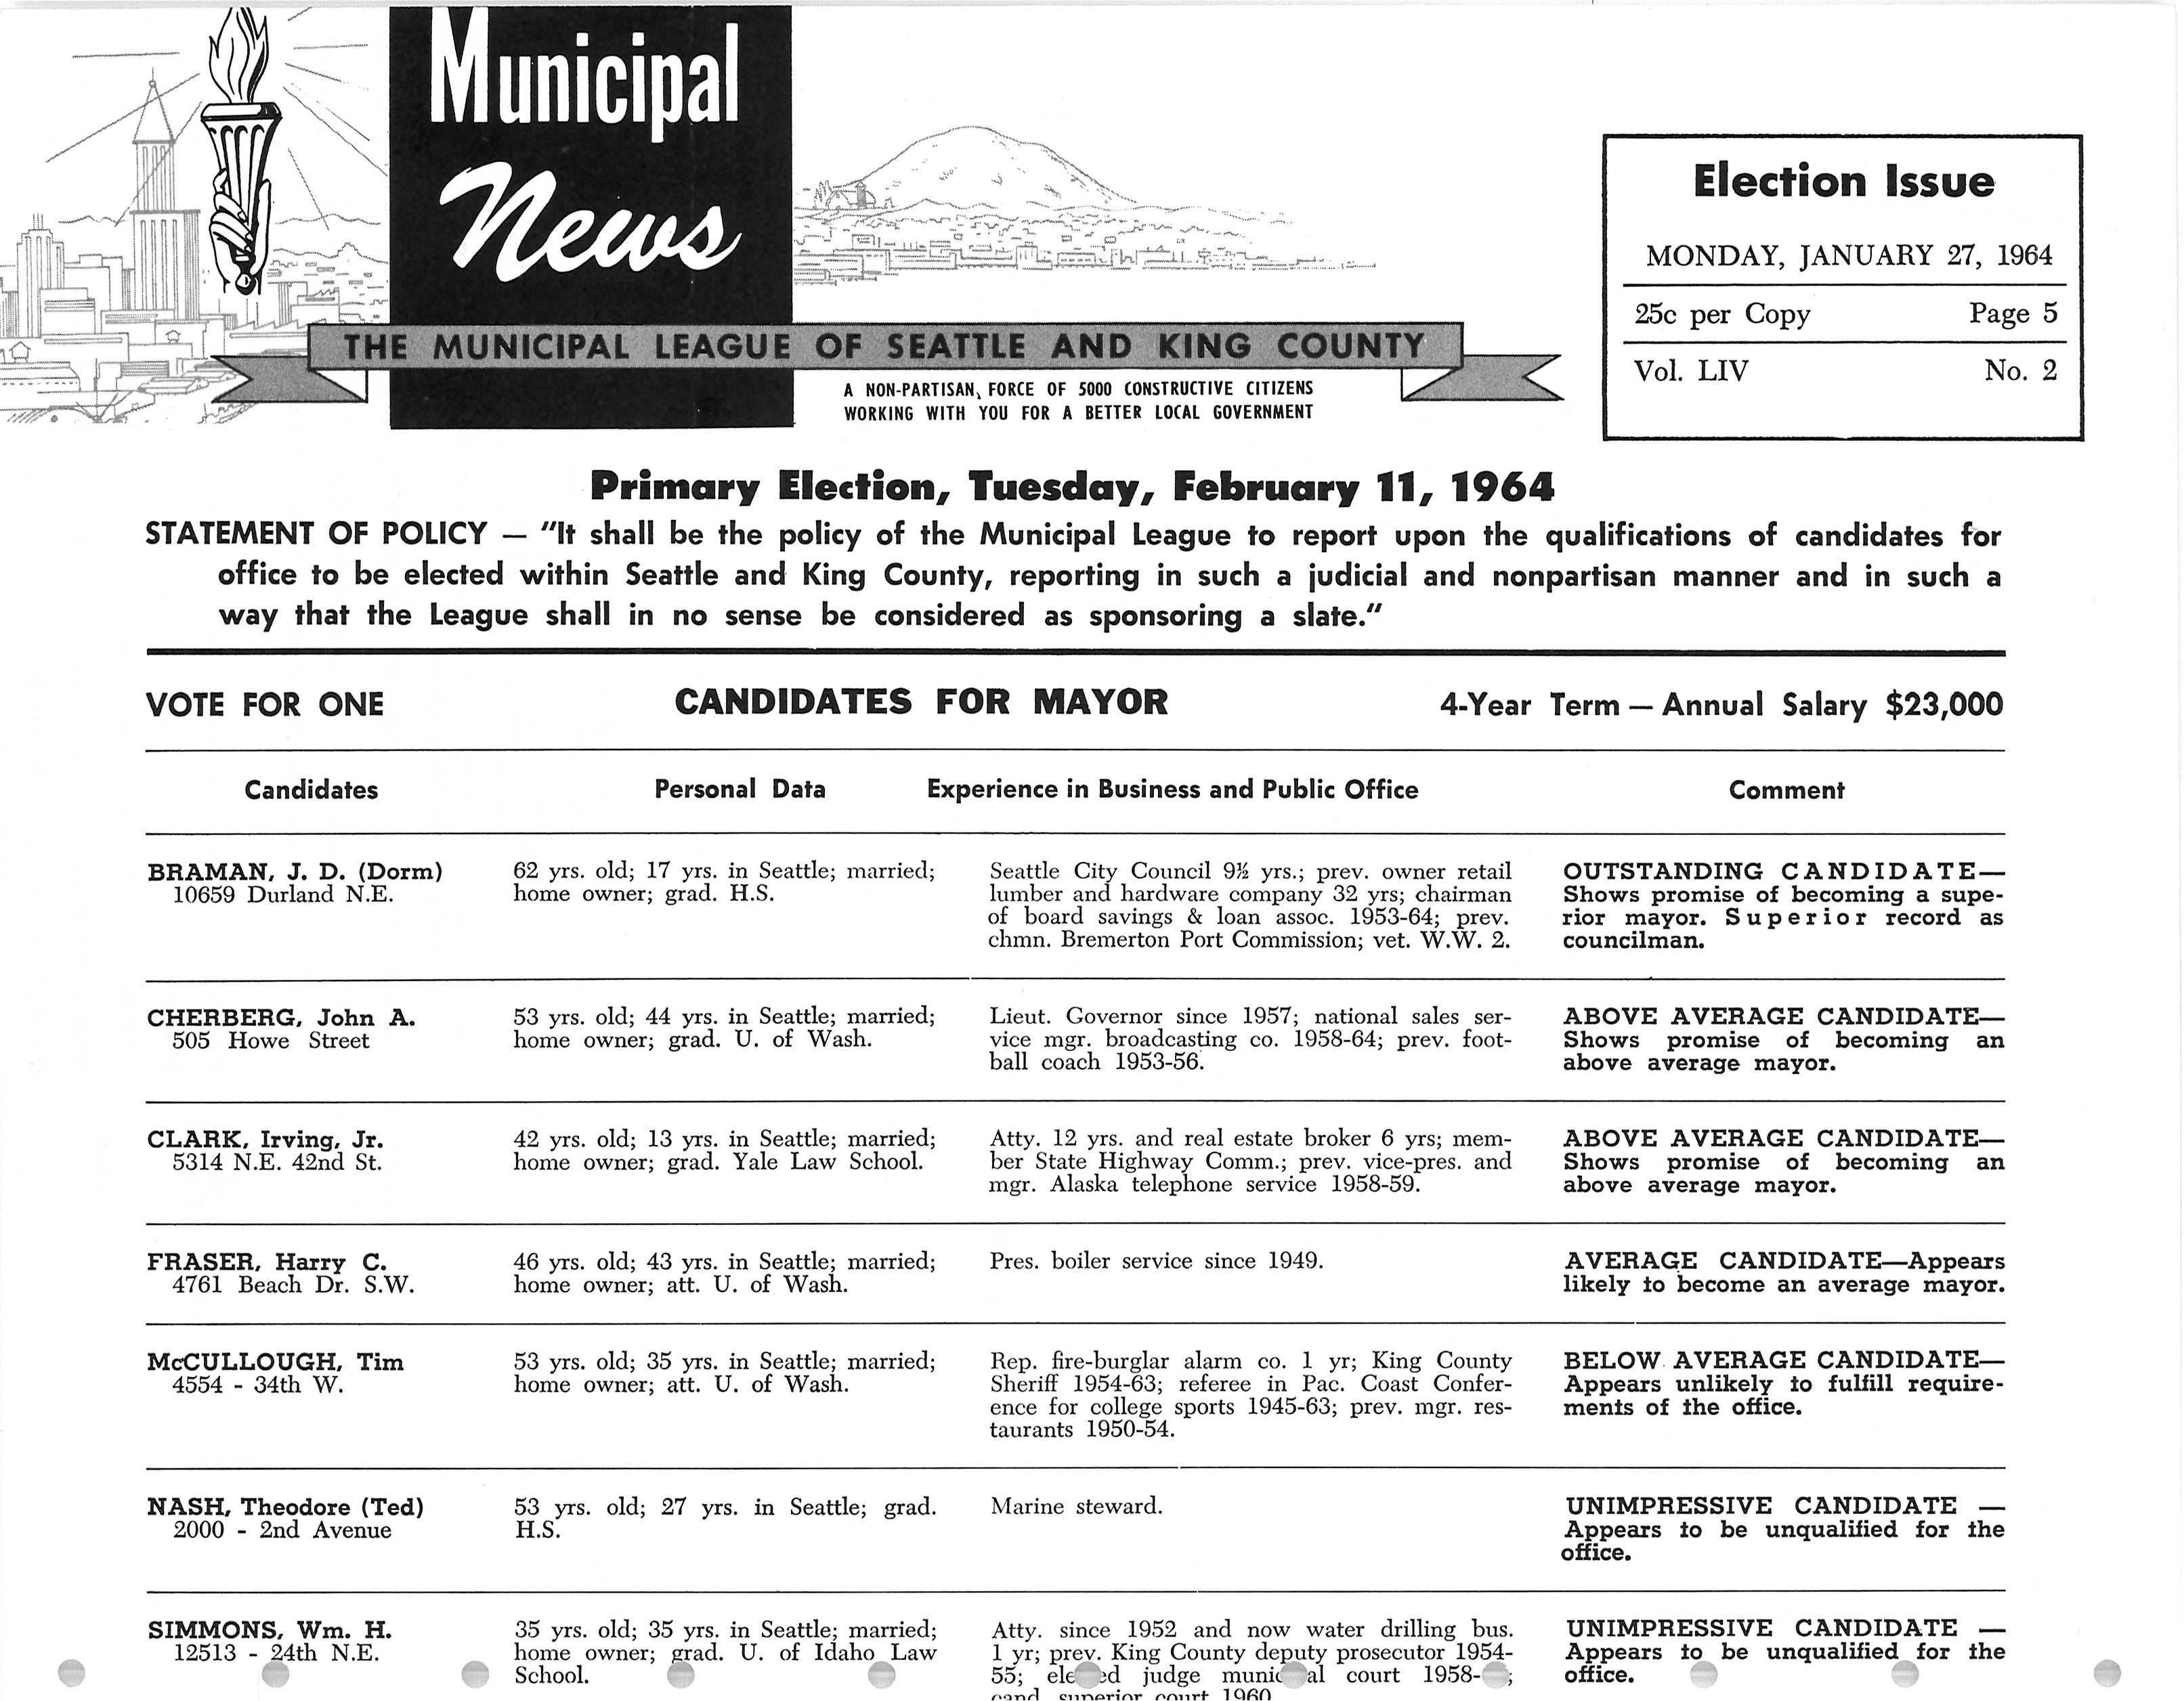 Municipal News, v. 54, no. 2, Jan. 27, 1964